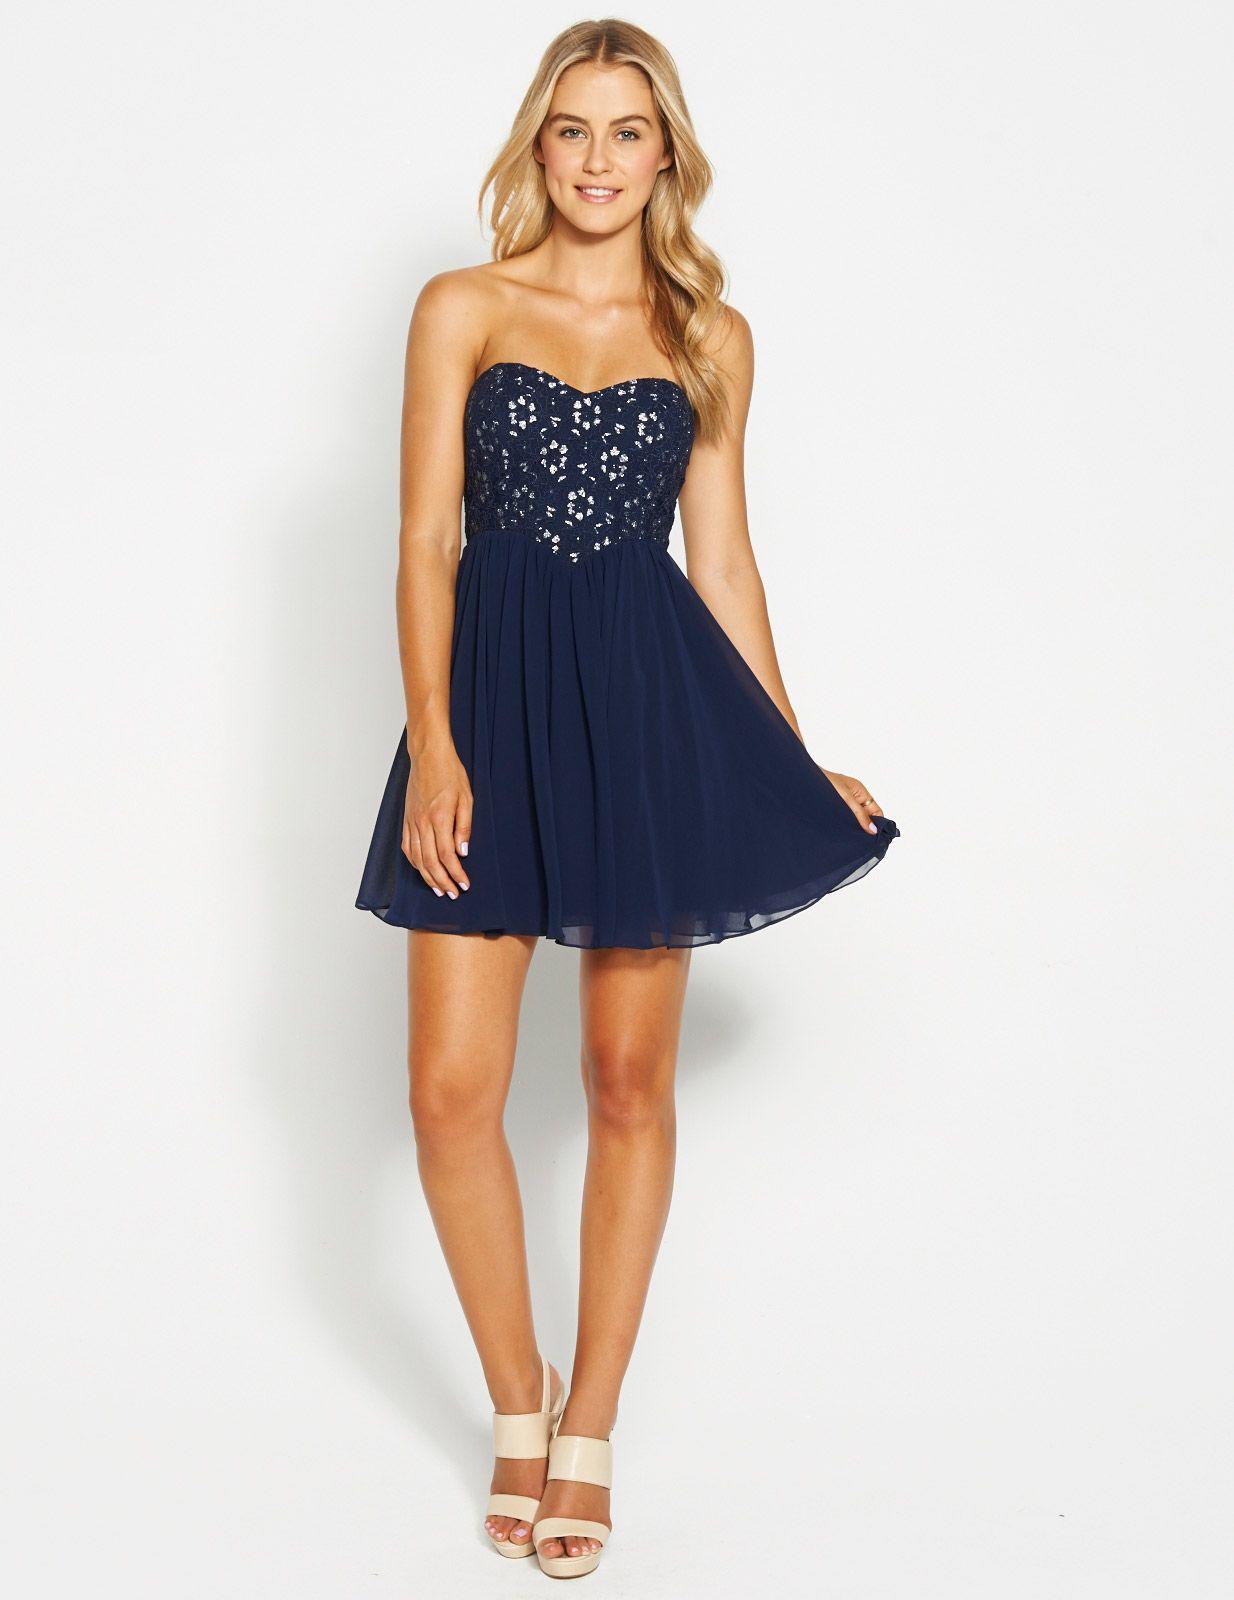 Dipped Waist Kelly Dress | Dotti | Clothes That I Love | Pinterest